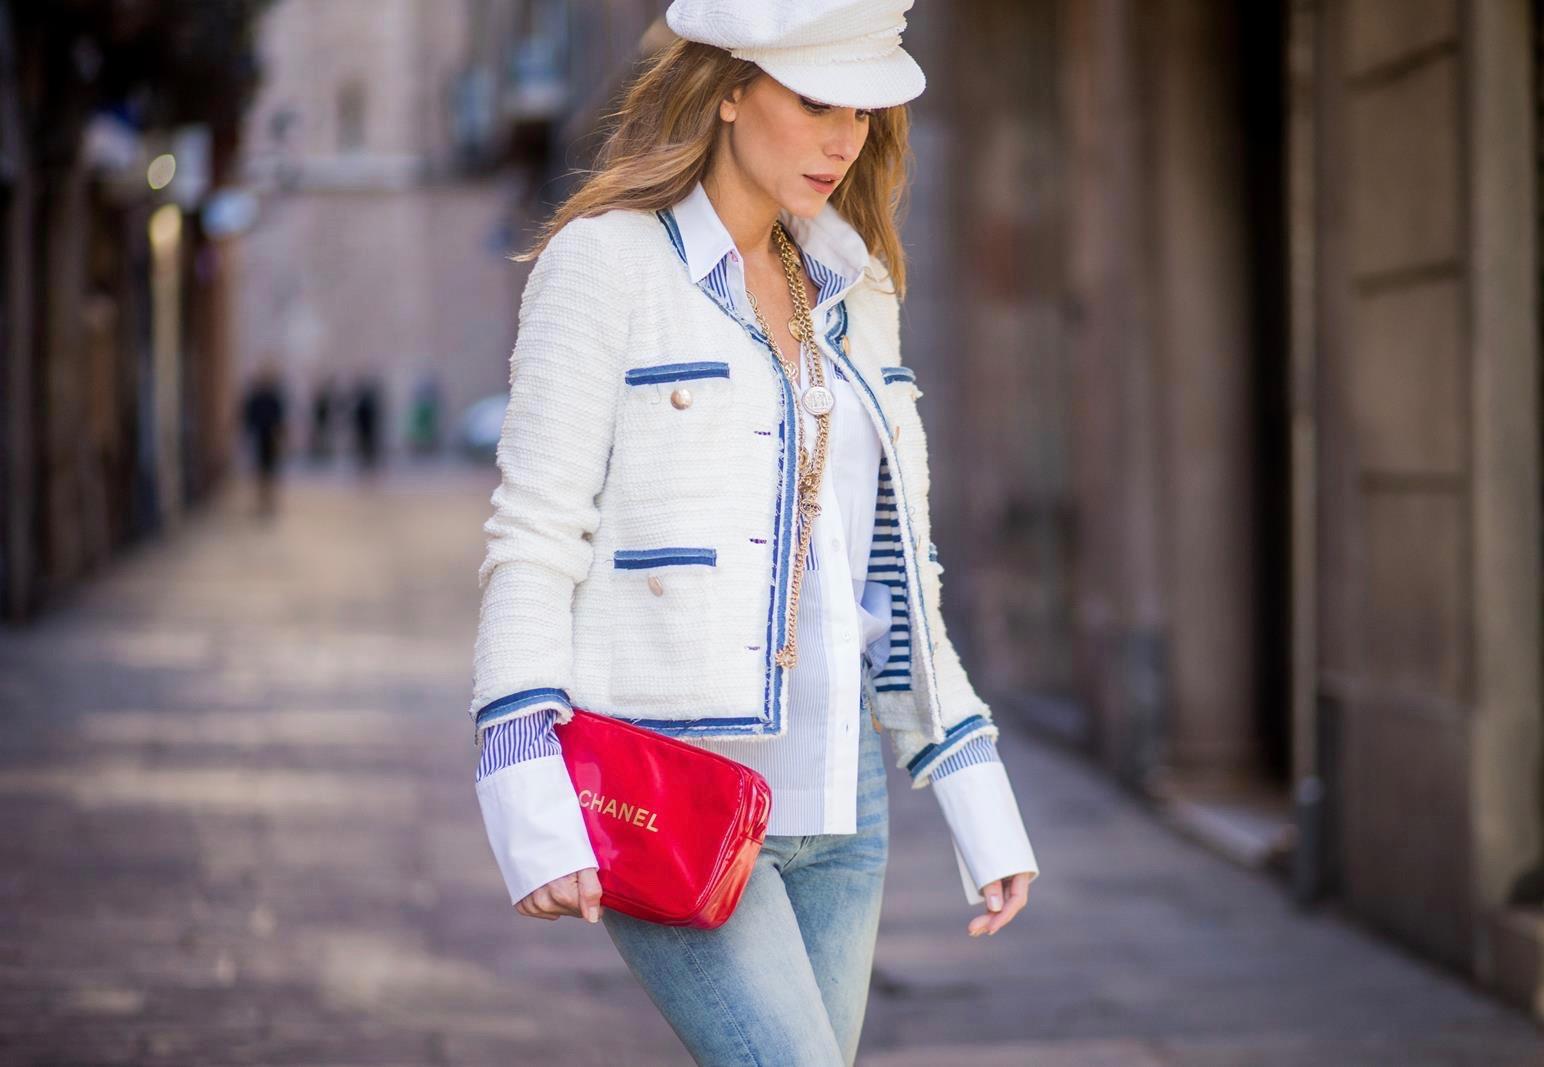 e39073385632 BARCELONA, SPAIN - NOVEMBER 28: Alexandra Lapp wearing a classic navy and white  tweed ...